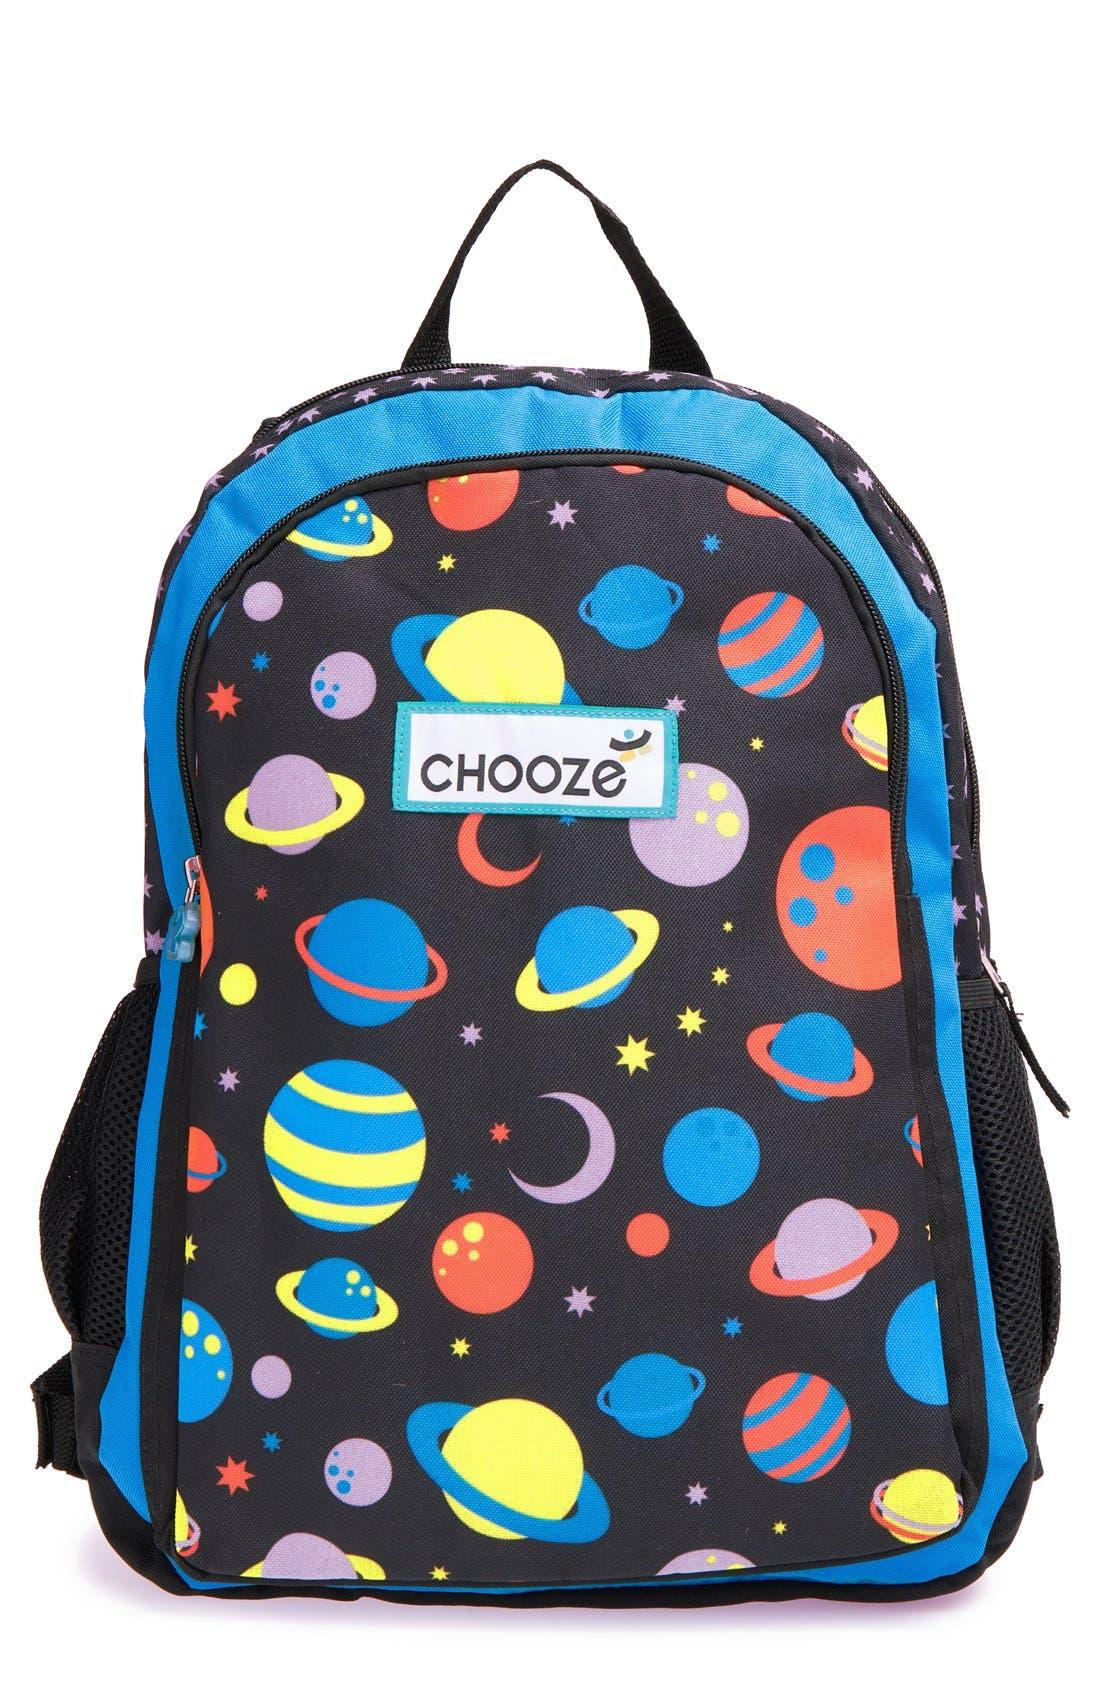 CHOOZE Reversible Backpack (Kids)